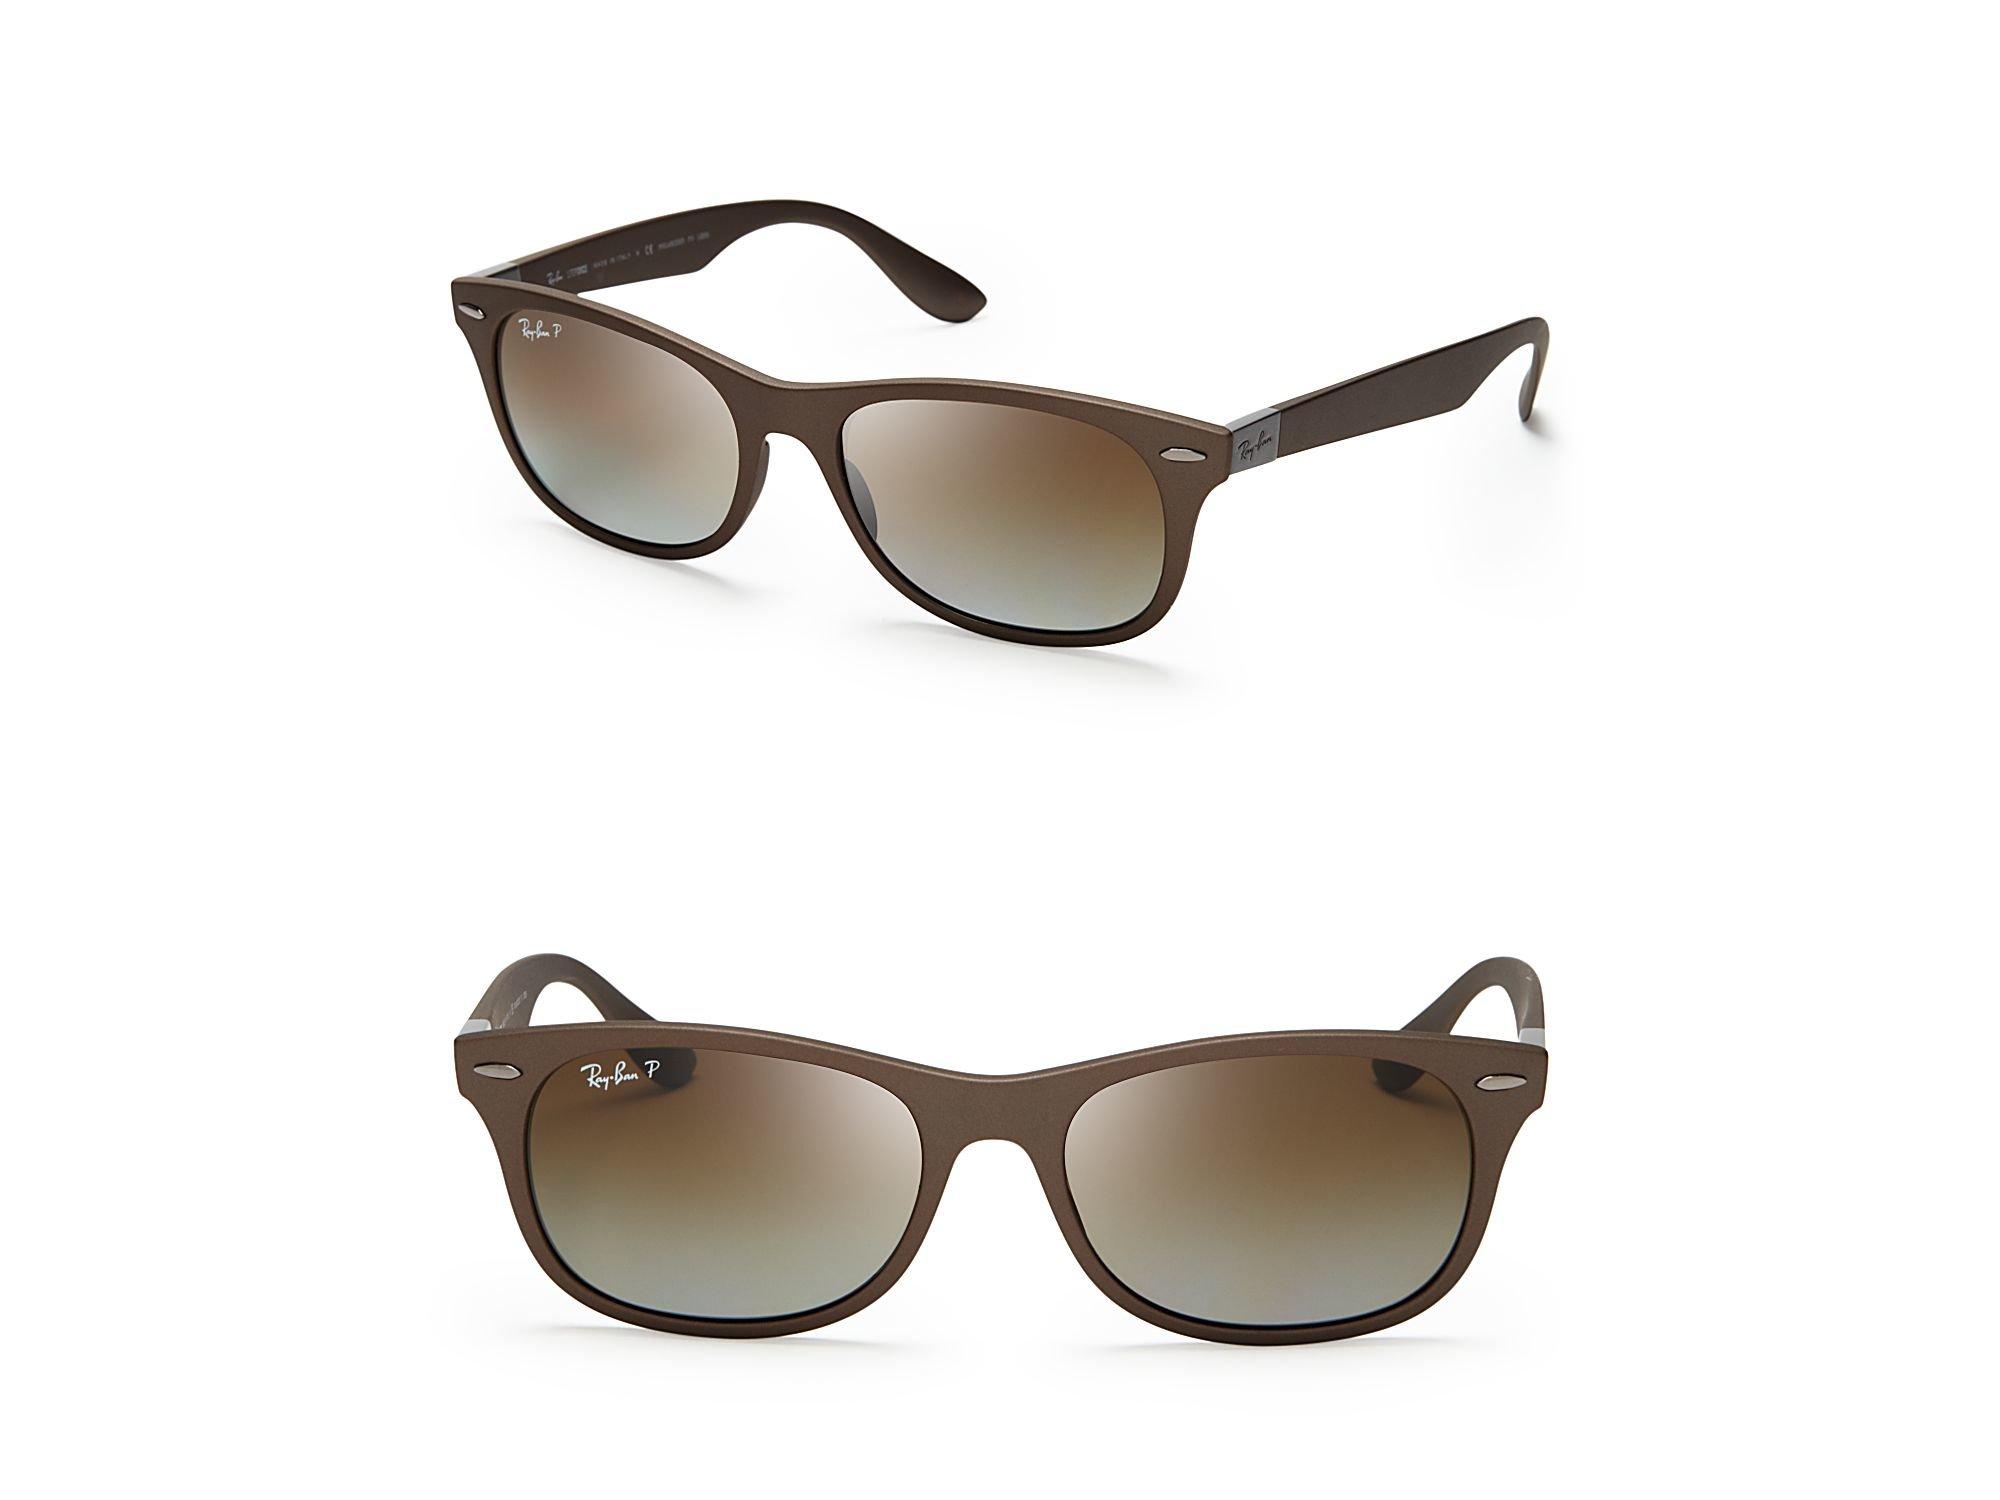 5cd429b1556 Buy Ray-Ban Women s Brown Polarized New Wayfarer Lite Force Sunglasses